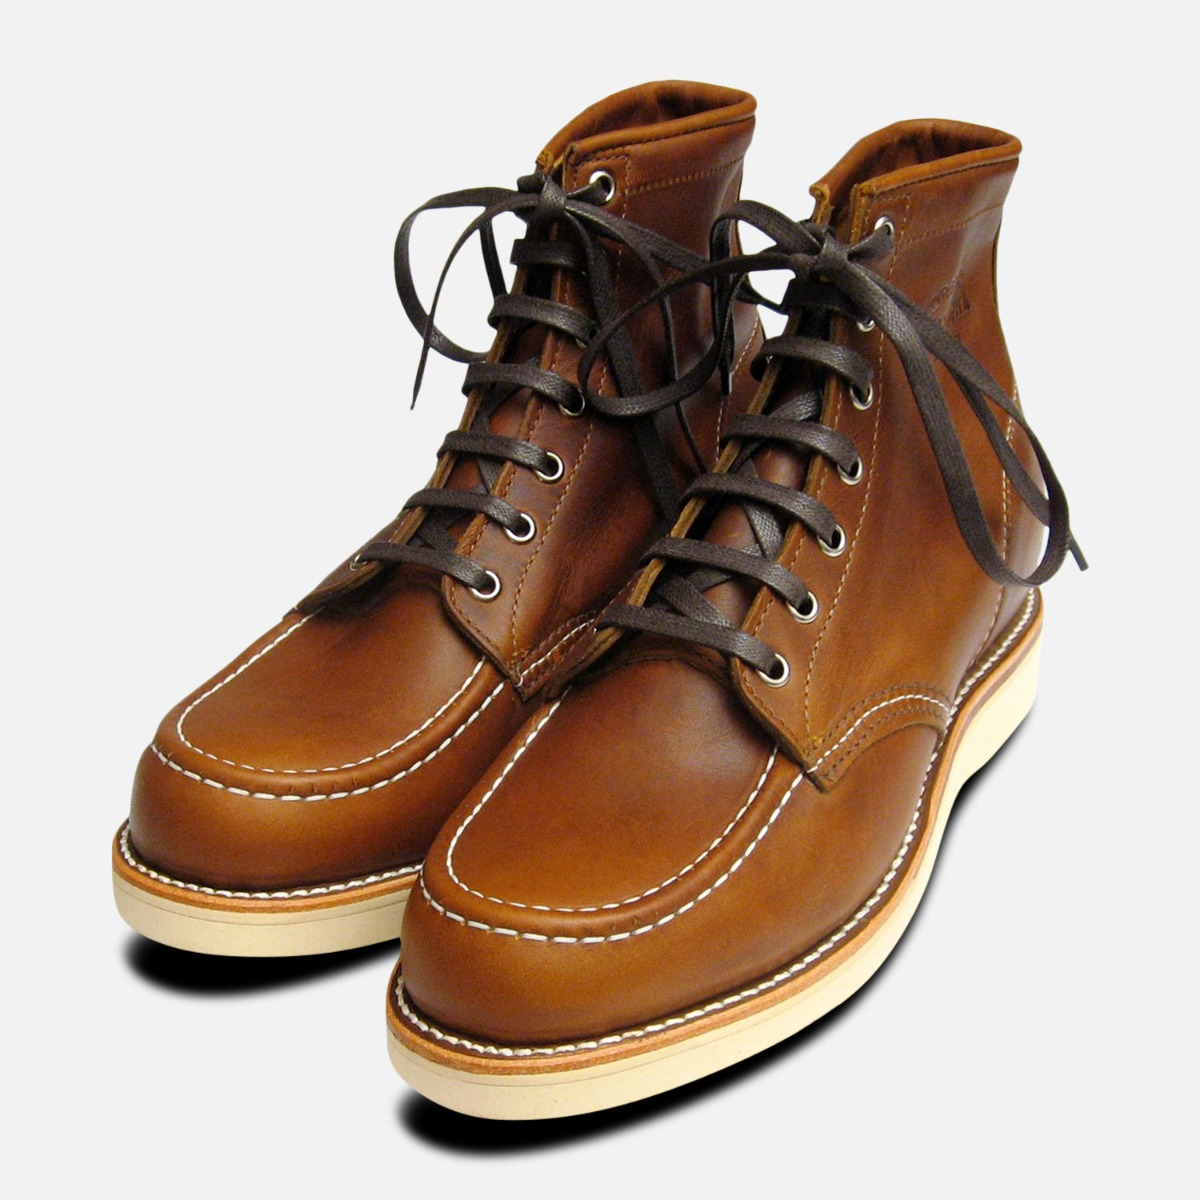 6264321443d Details about Chippewa Shoes Tan Renegade Leather 1901M22 Vibram Sole Moc  Toe Boots